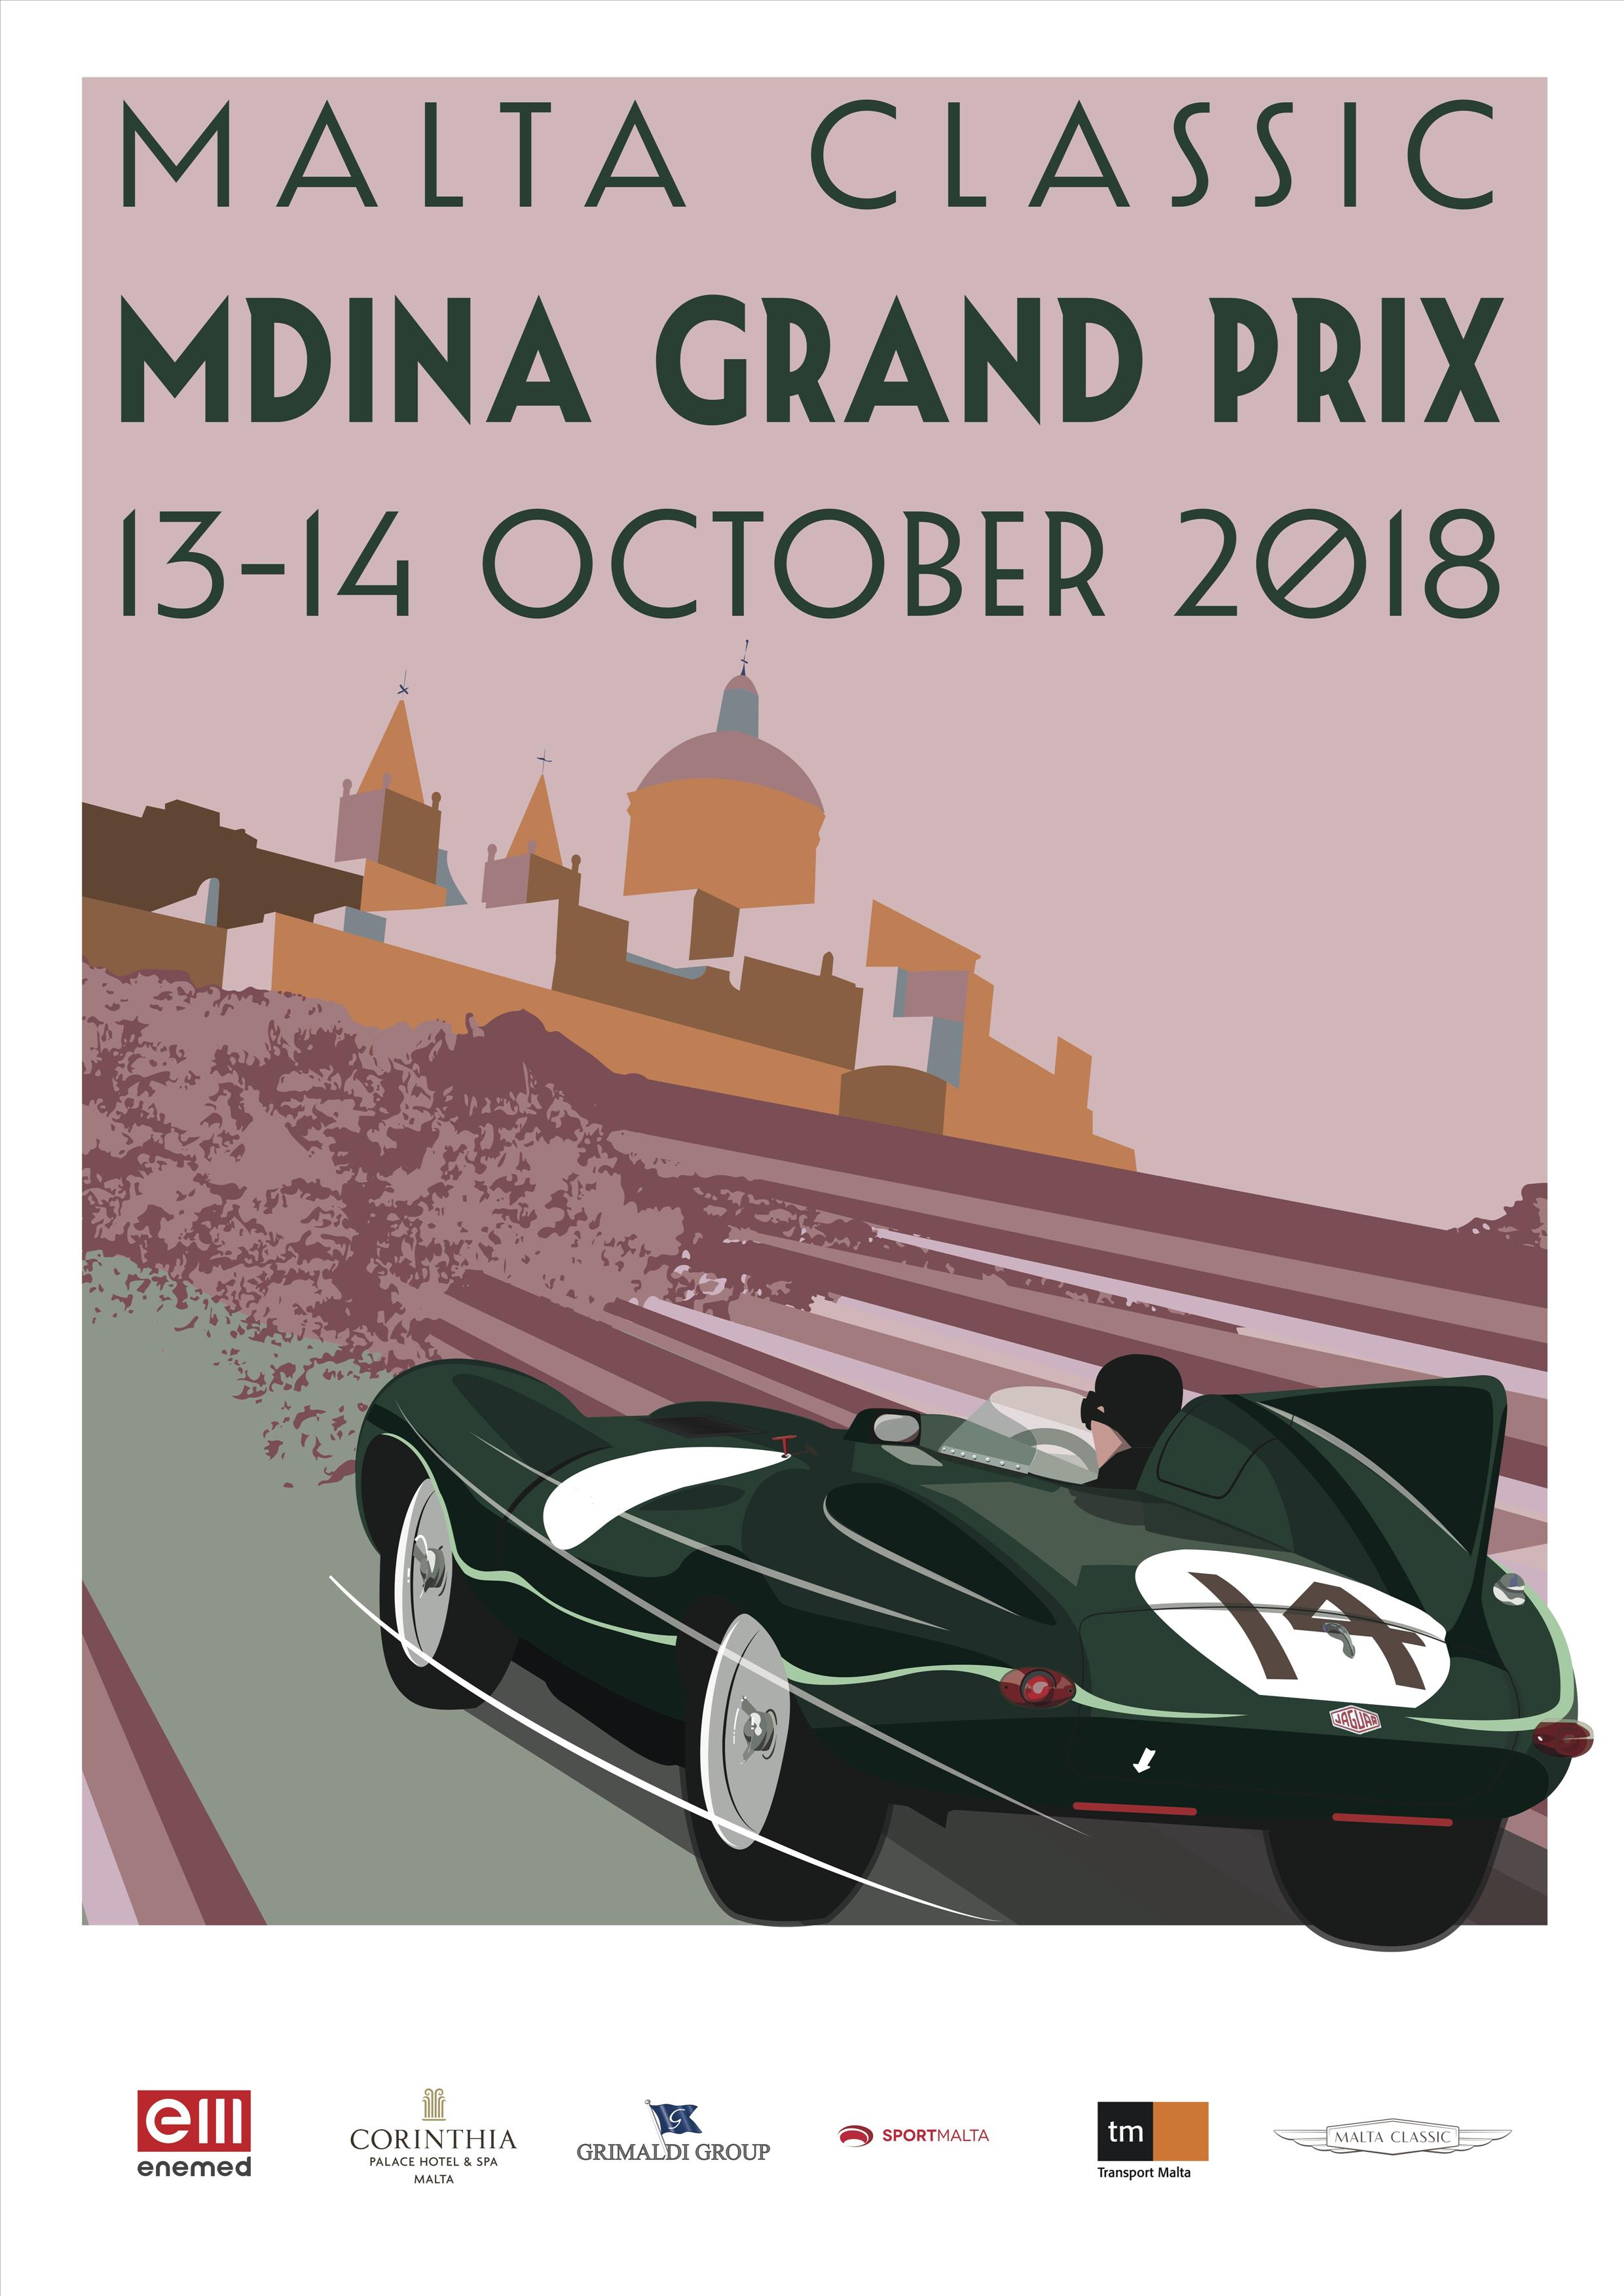 Malta Classic 2018 flyer